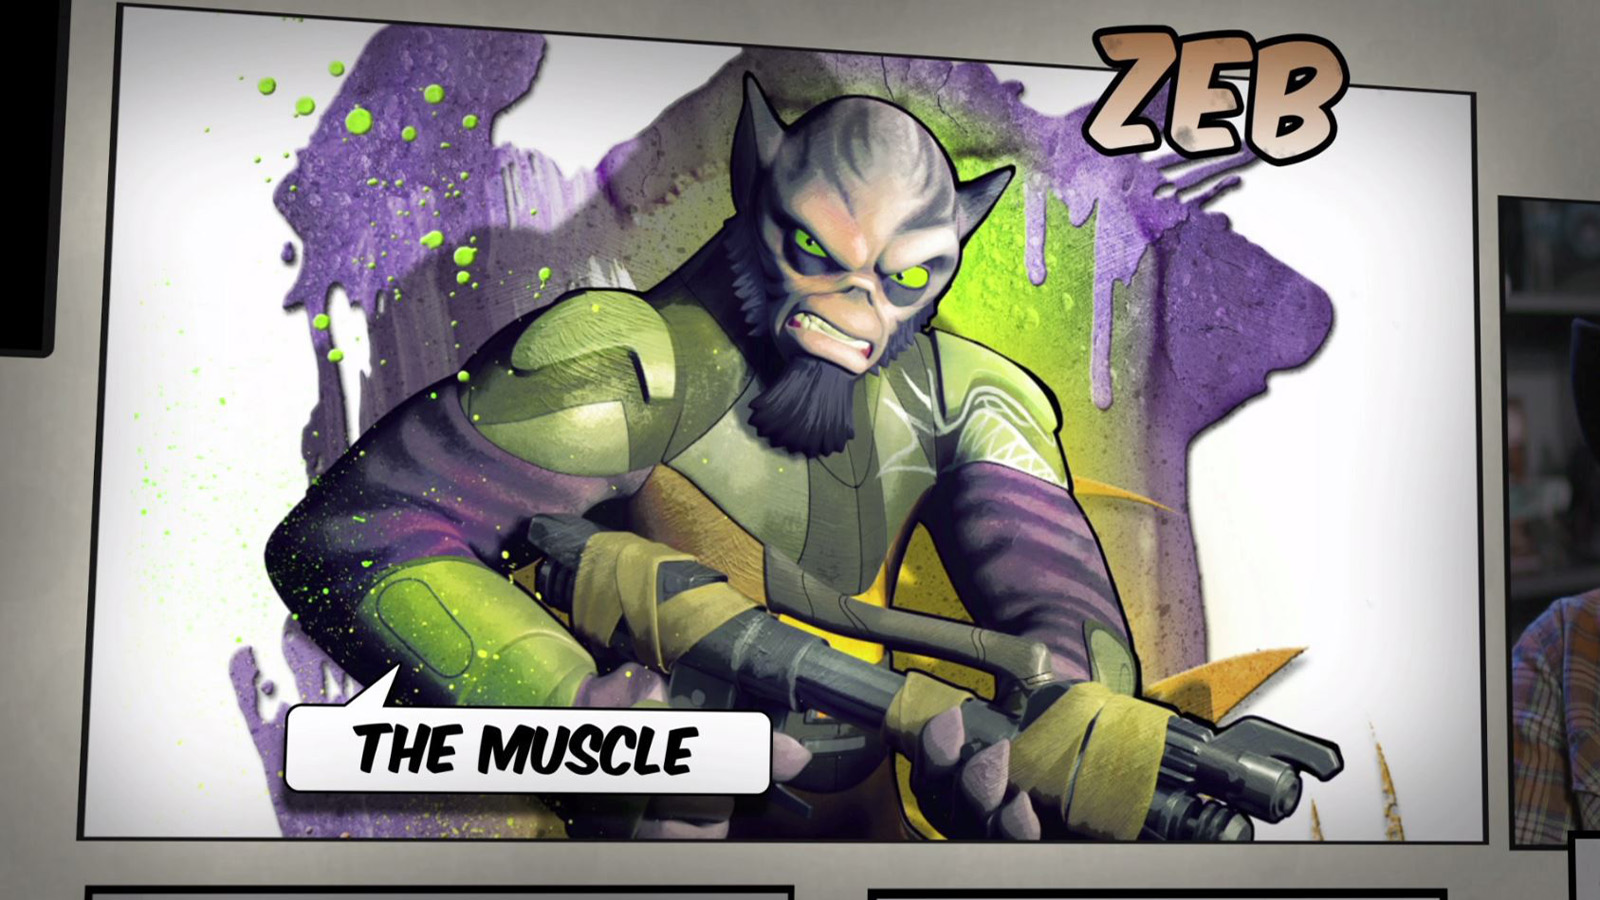 Star Wars Rebels: Meet Zeb, the Muscle